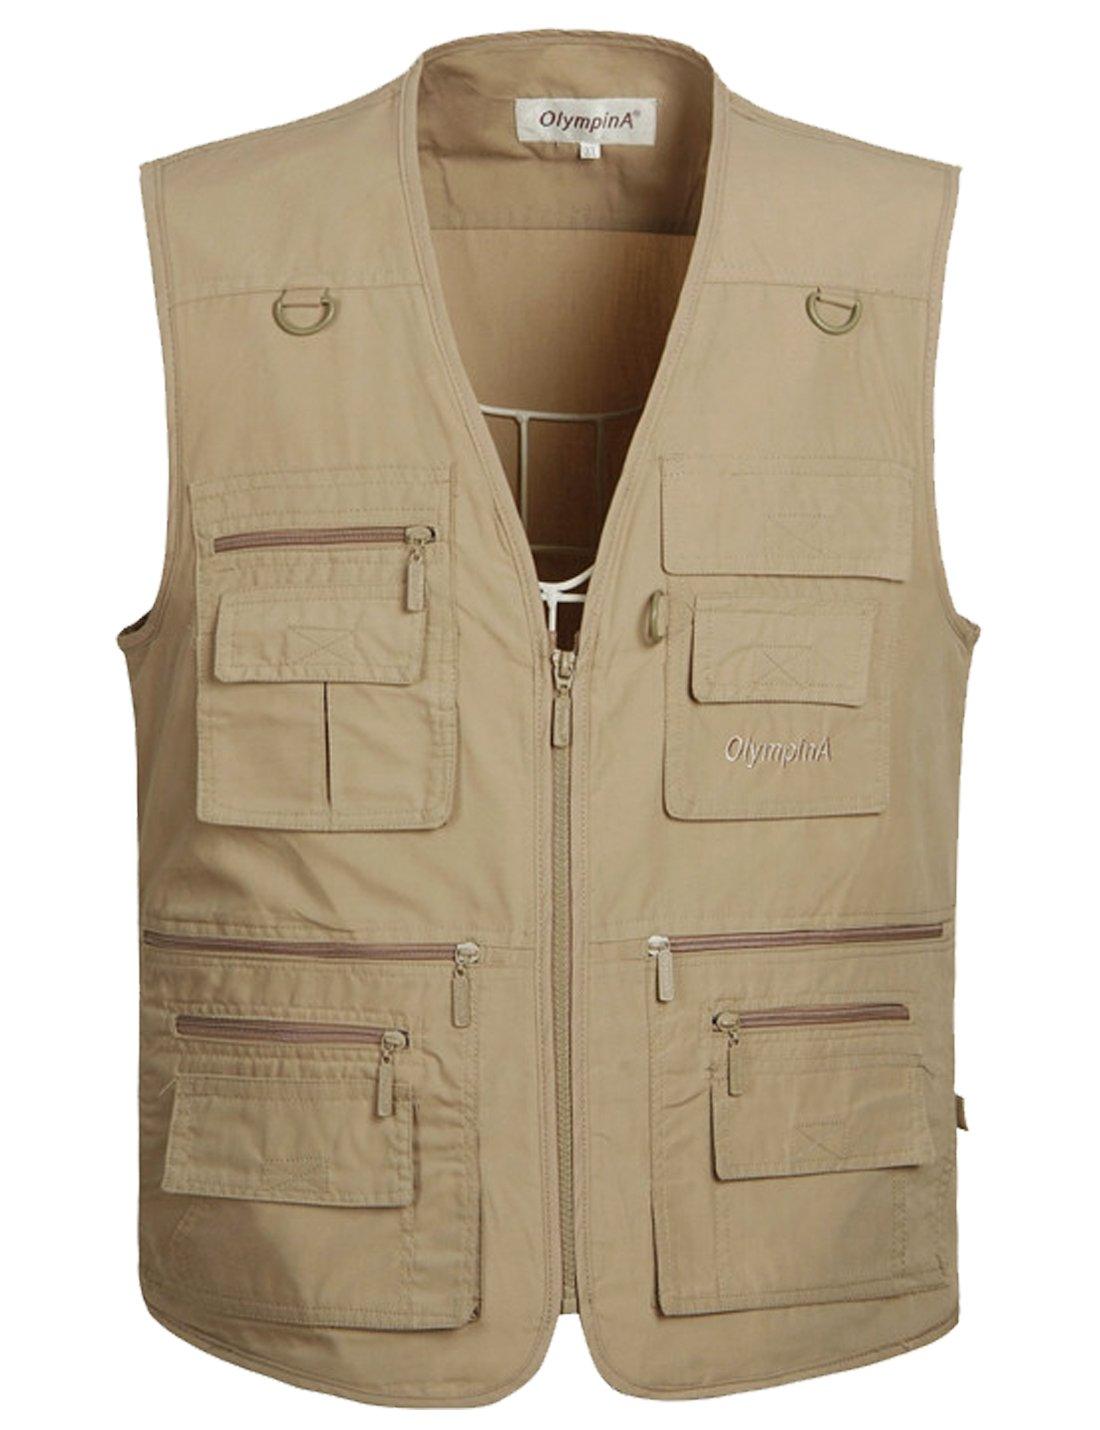 Flygo Men's Summer Casual Outdoor Utility 16 Pockets Journalist Fishing Photo Travel Vest Plus Size (Large, Khaki)